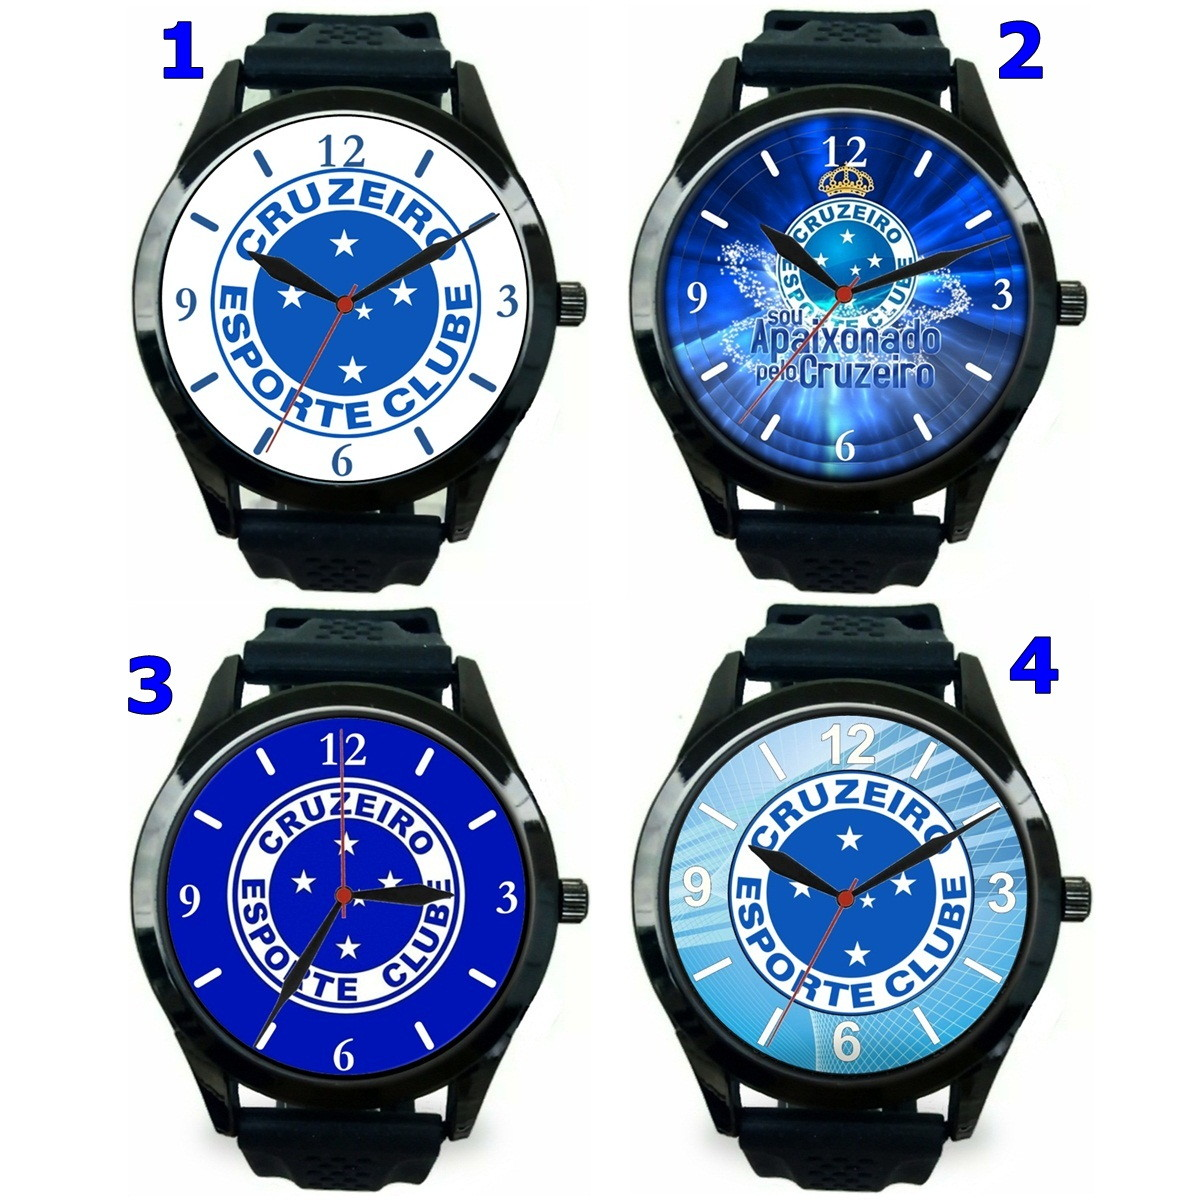 8ba36afee8b 1 Relógio pulso personalizado esportivo Cruzeiro barato no Elo7 ...